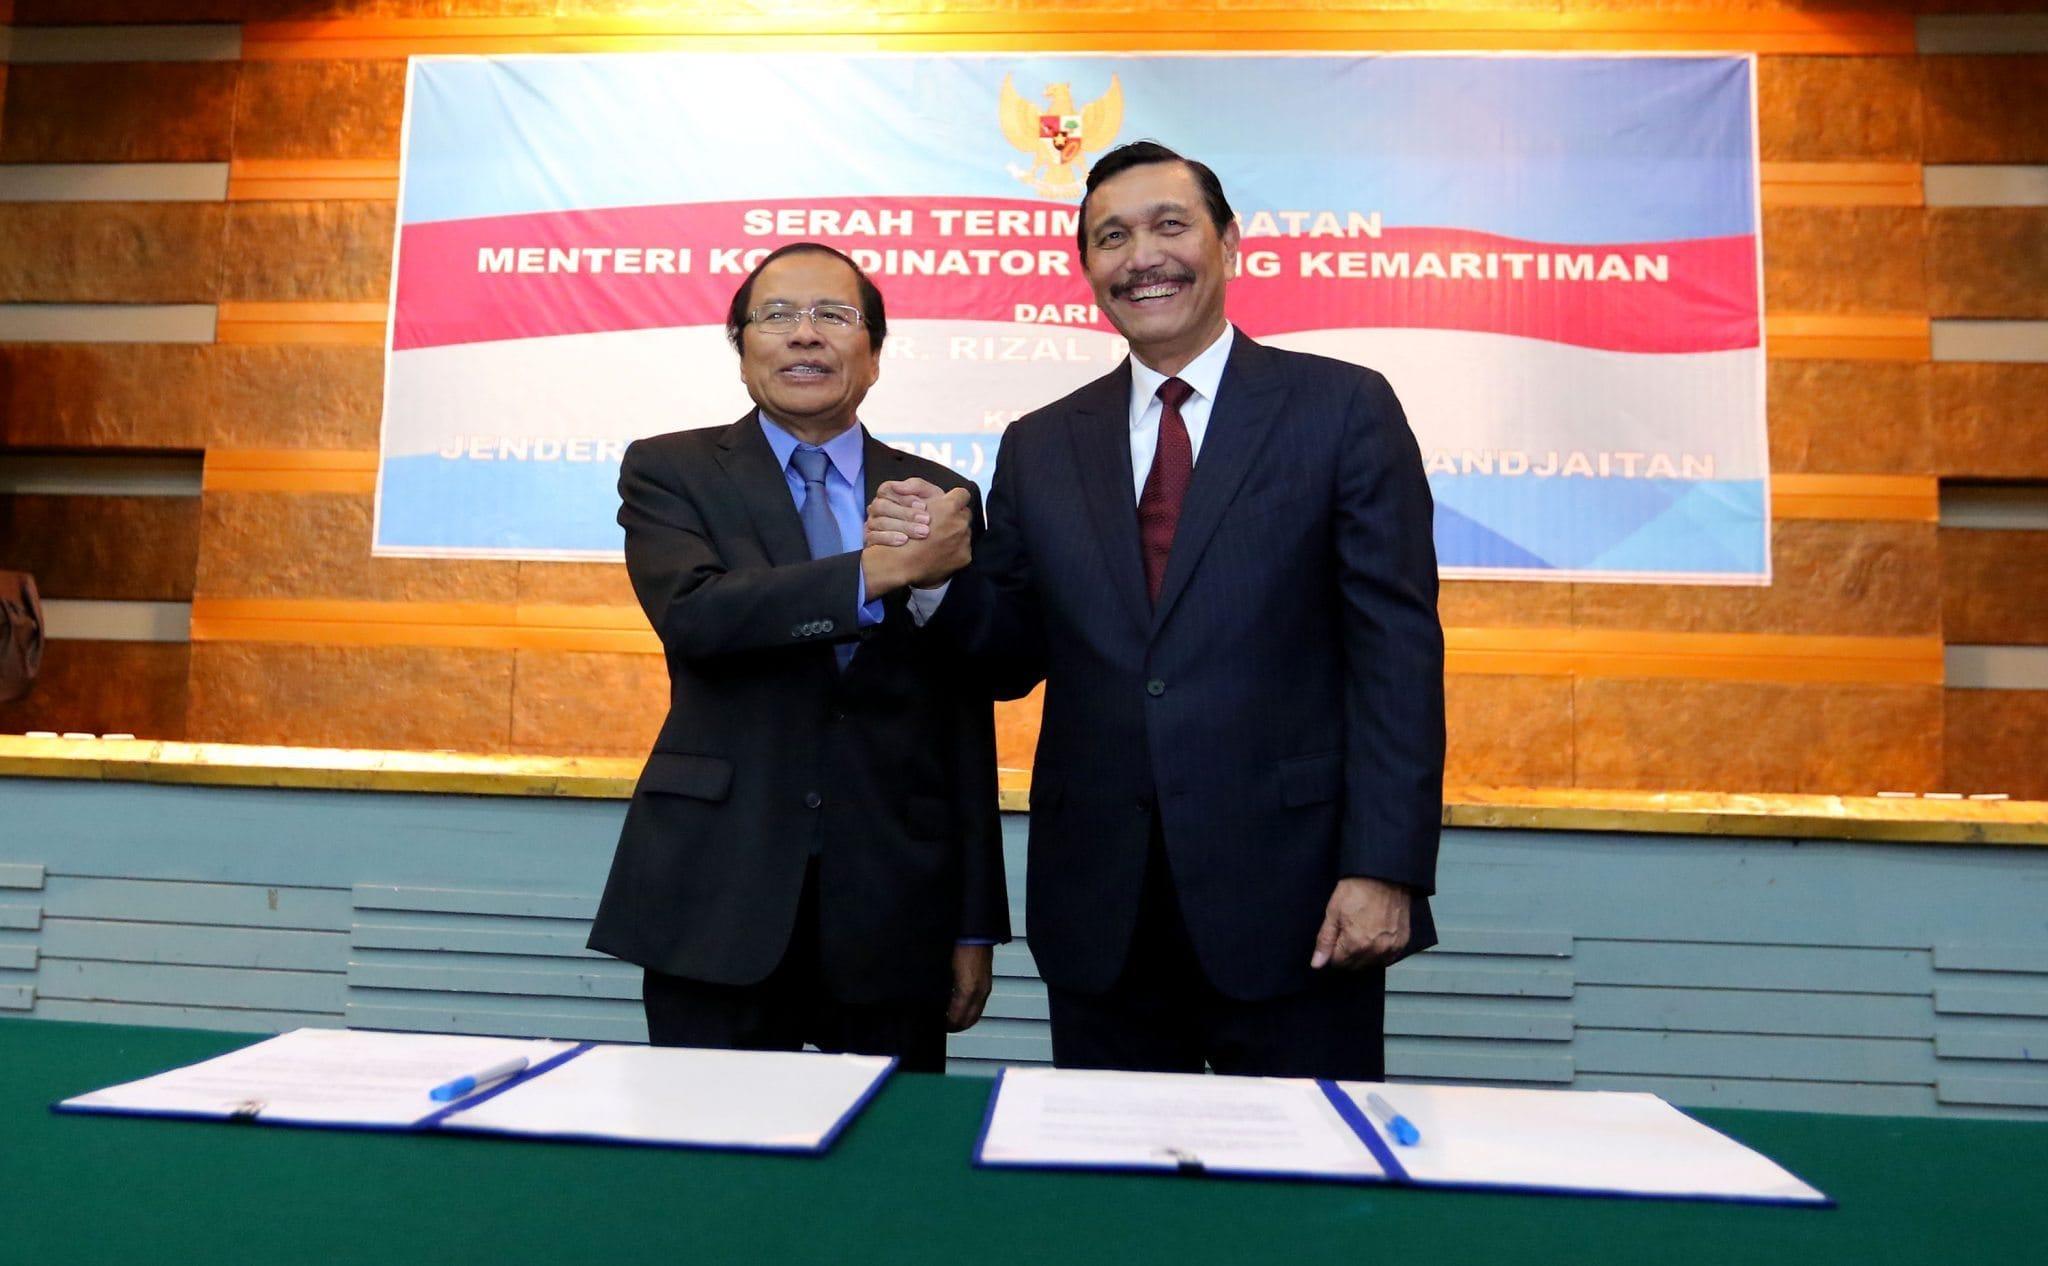 Serah Terima Jabatan Menteri Koordinator Bidang Kemaritiman Jakarta, 28 Juli 2016